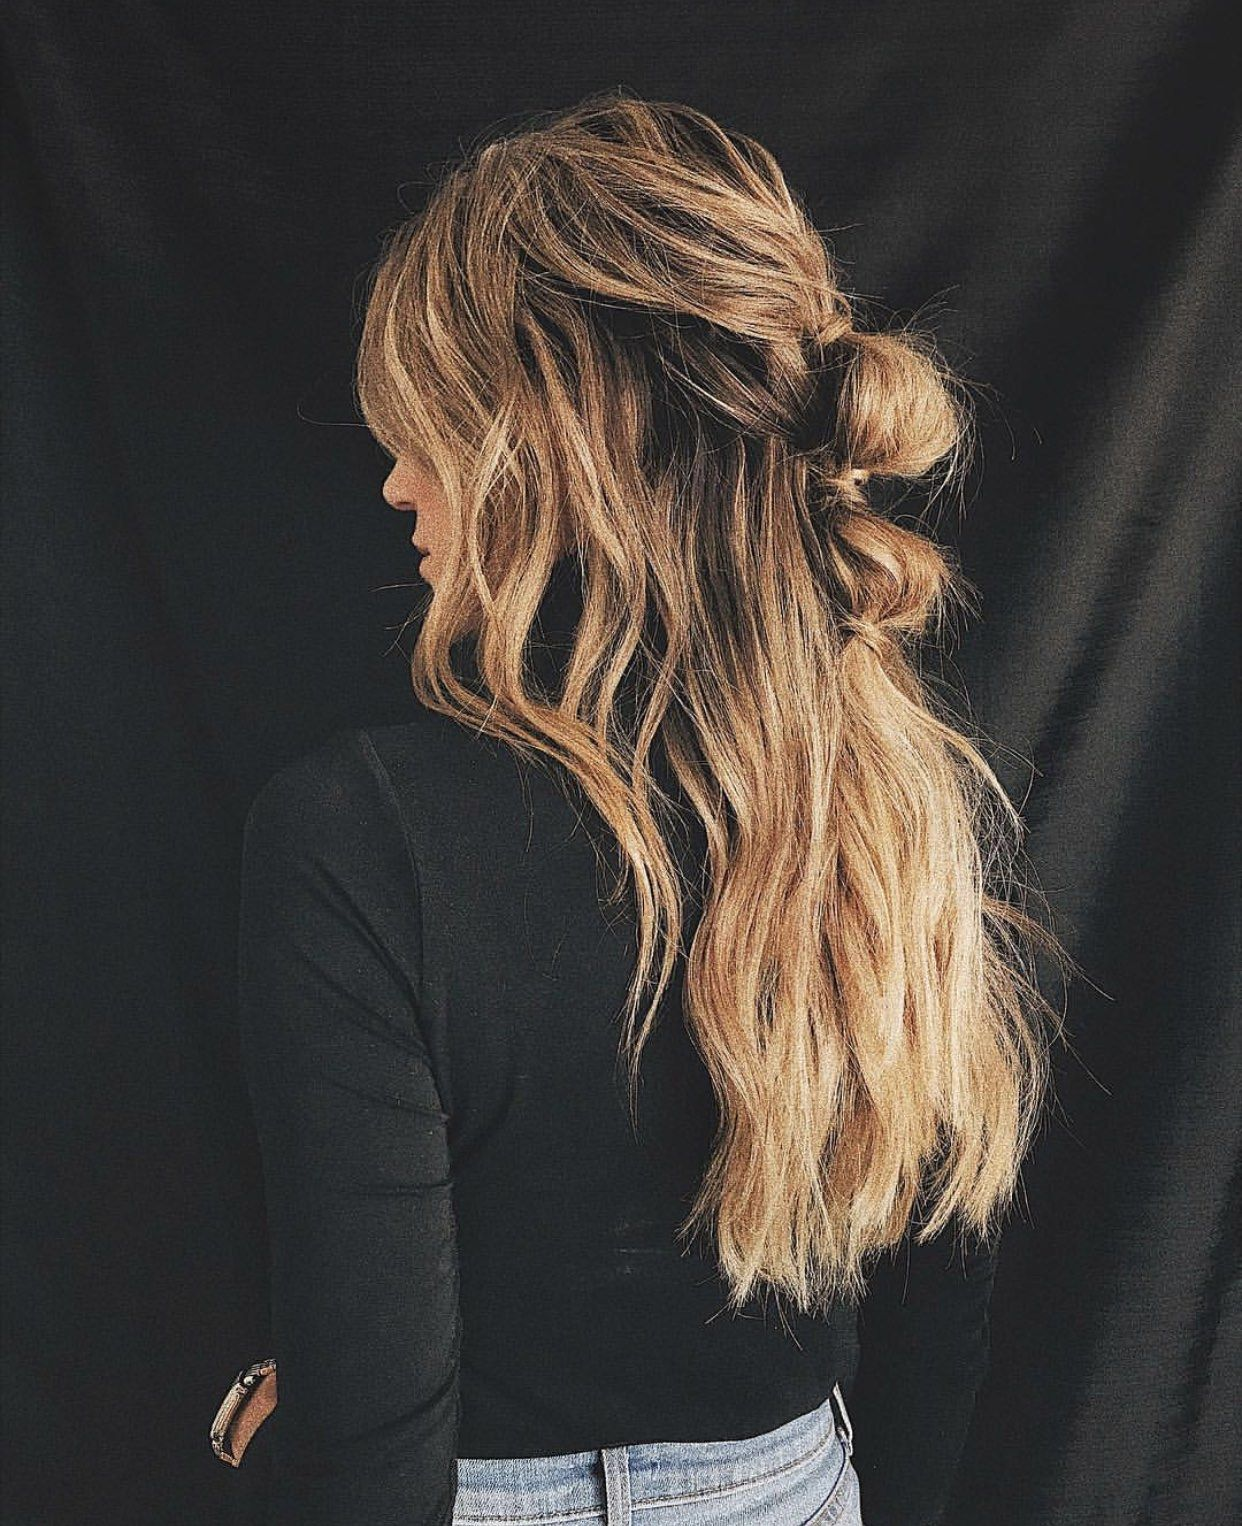 My 5 Most Pinned Hairstyles On Pinterest Long Hair Styles Messy Beach Hair Hair Styles